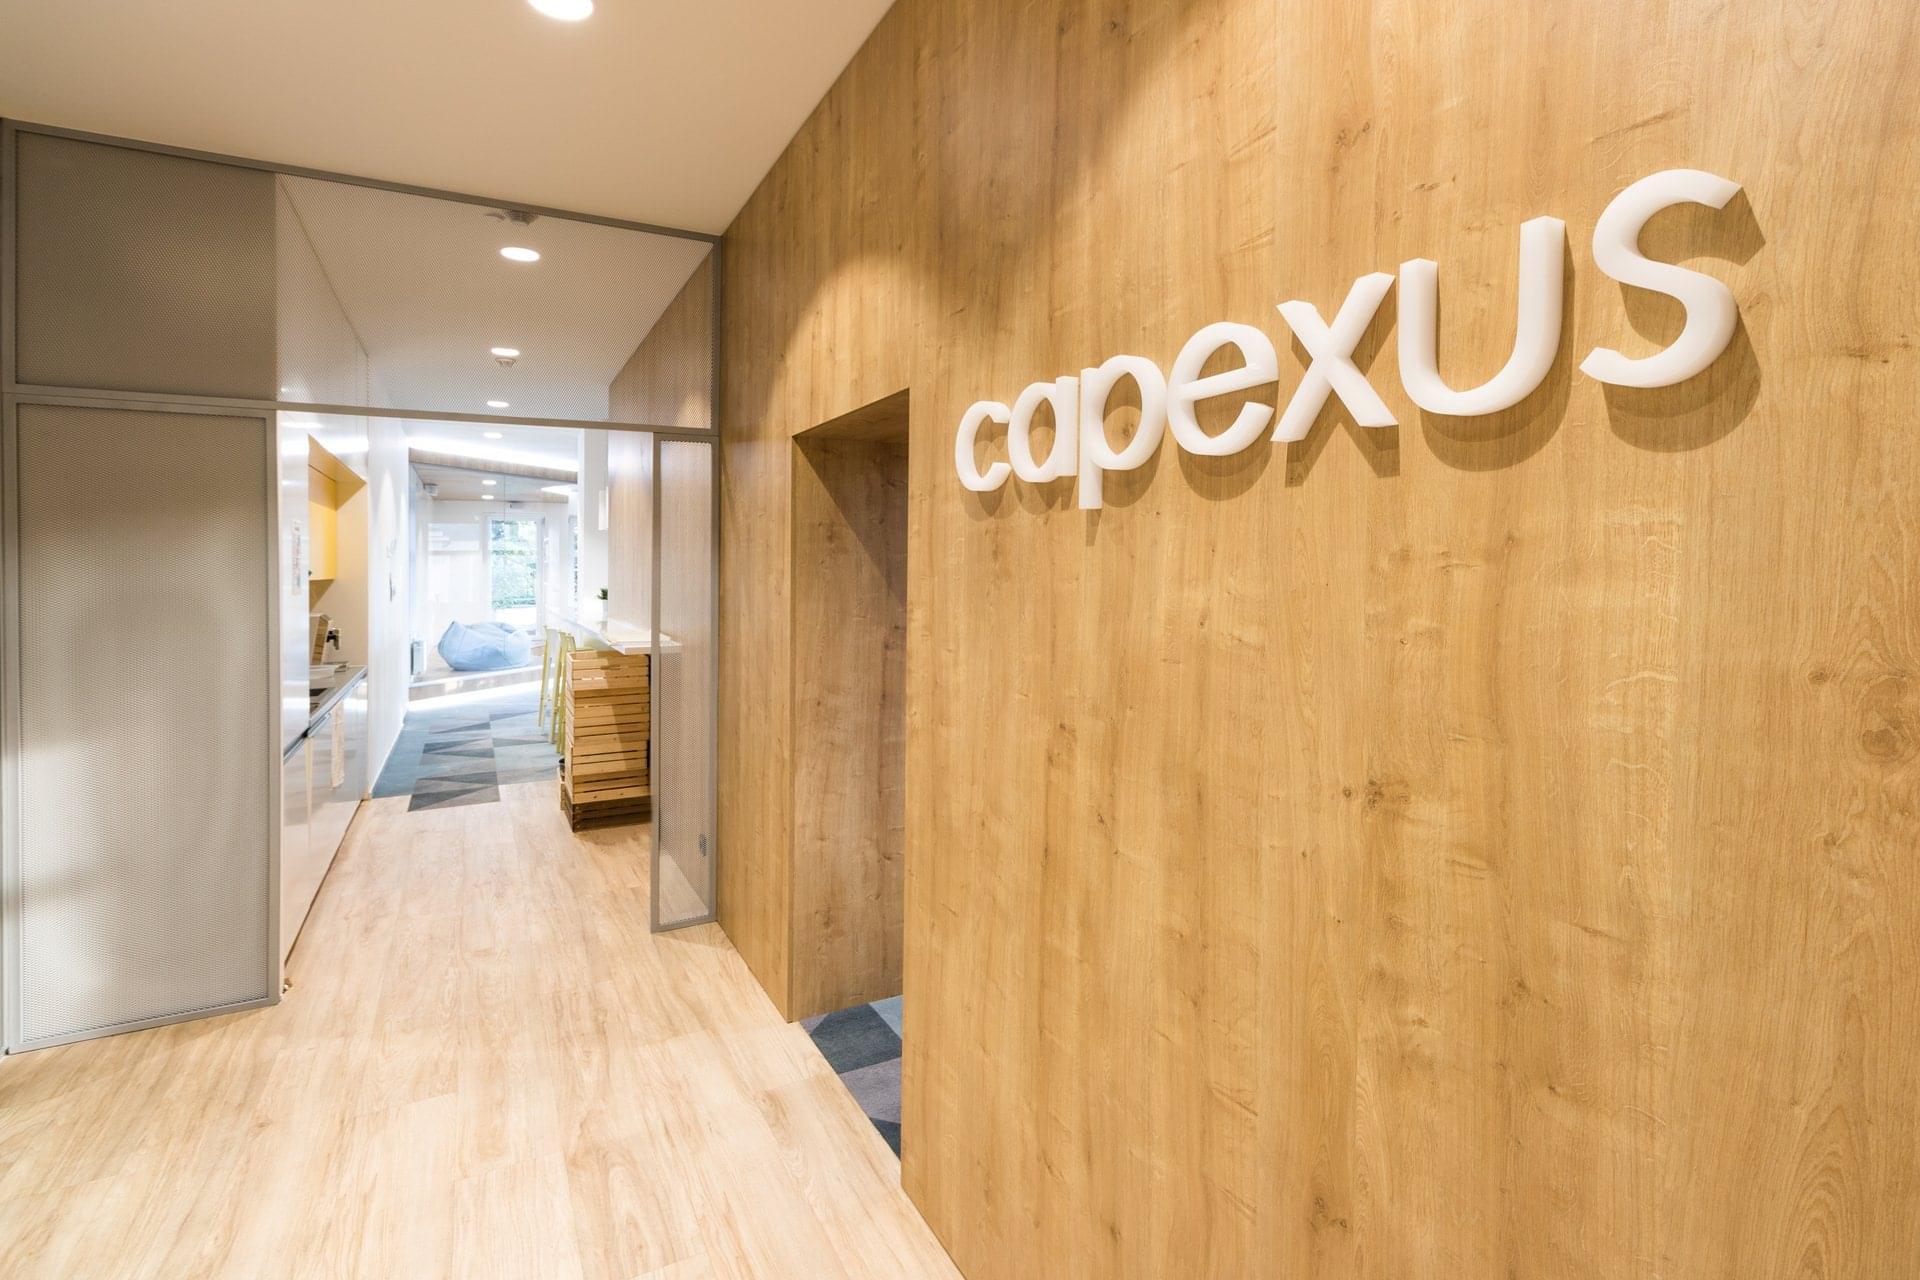 Capexus